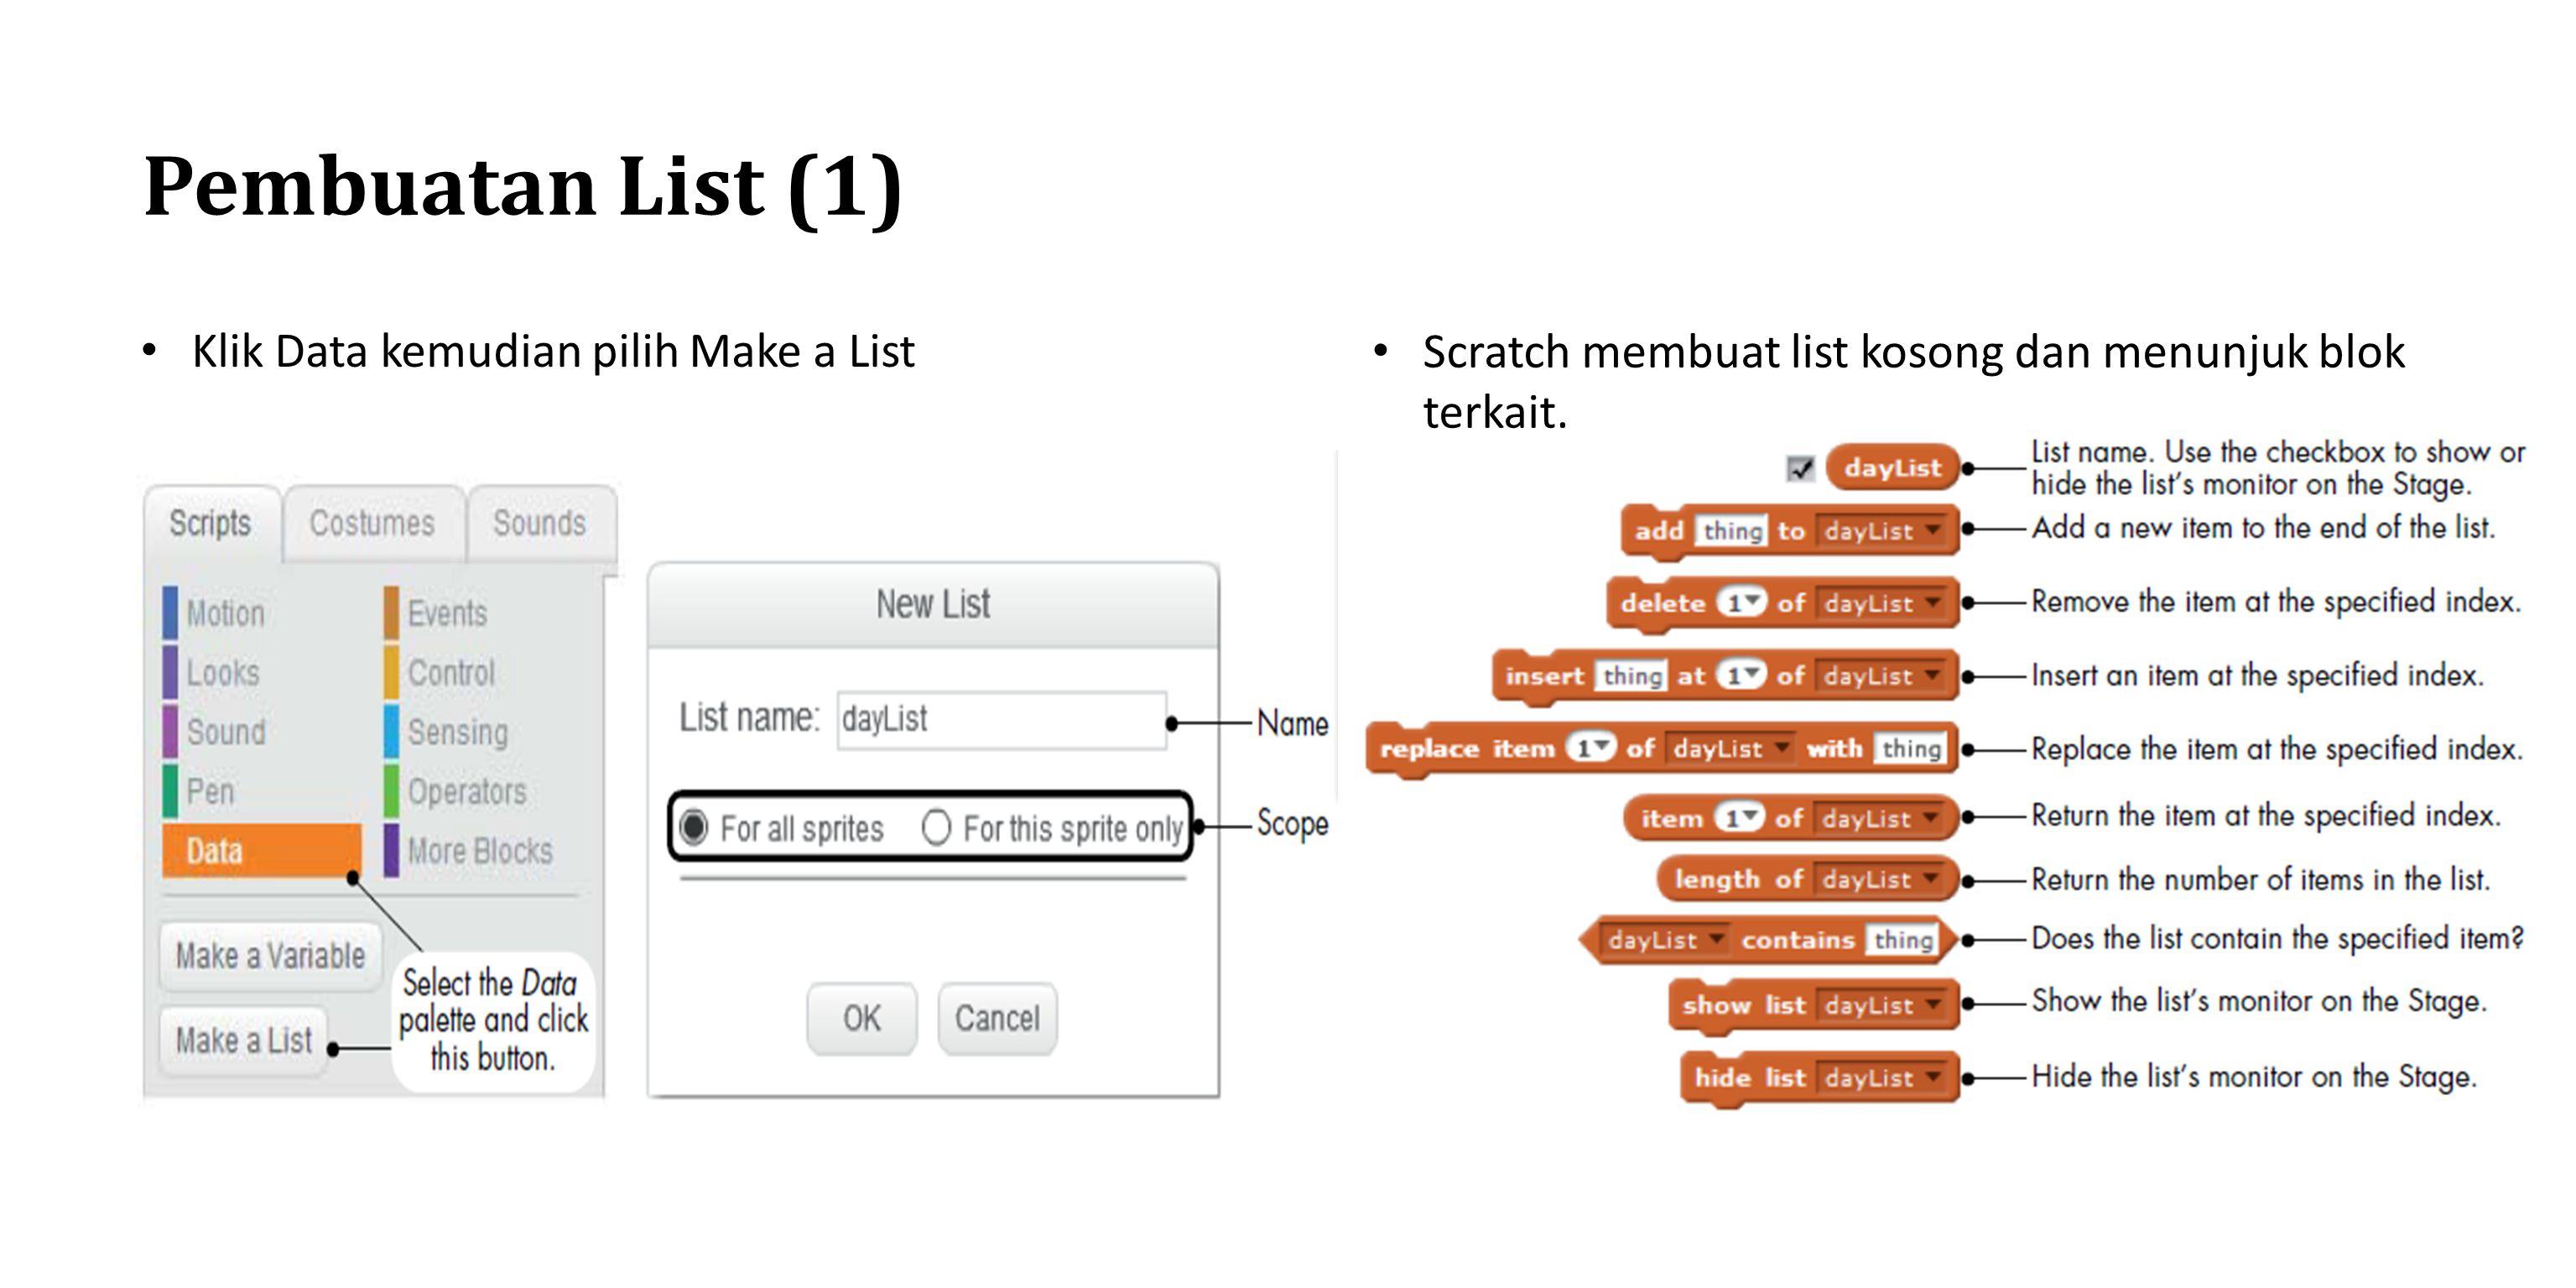 Pembuatan List (1) Klik Data kemudian pilih Make a List Scratch membuat list kosong dan menunjuk blok terkait.